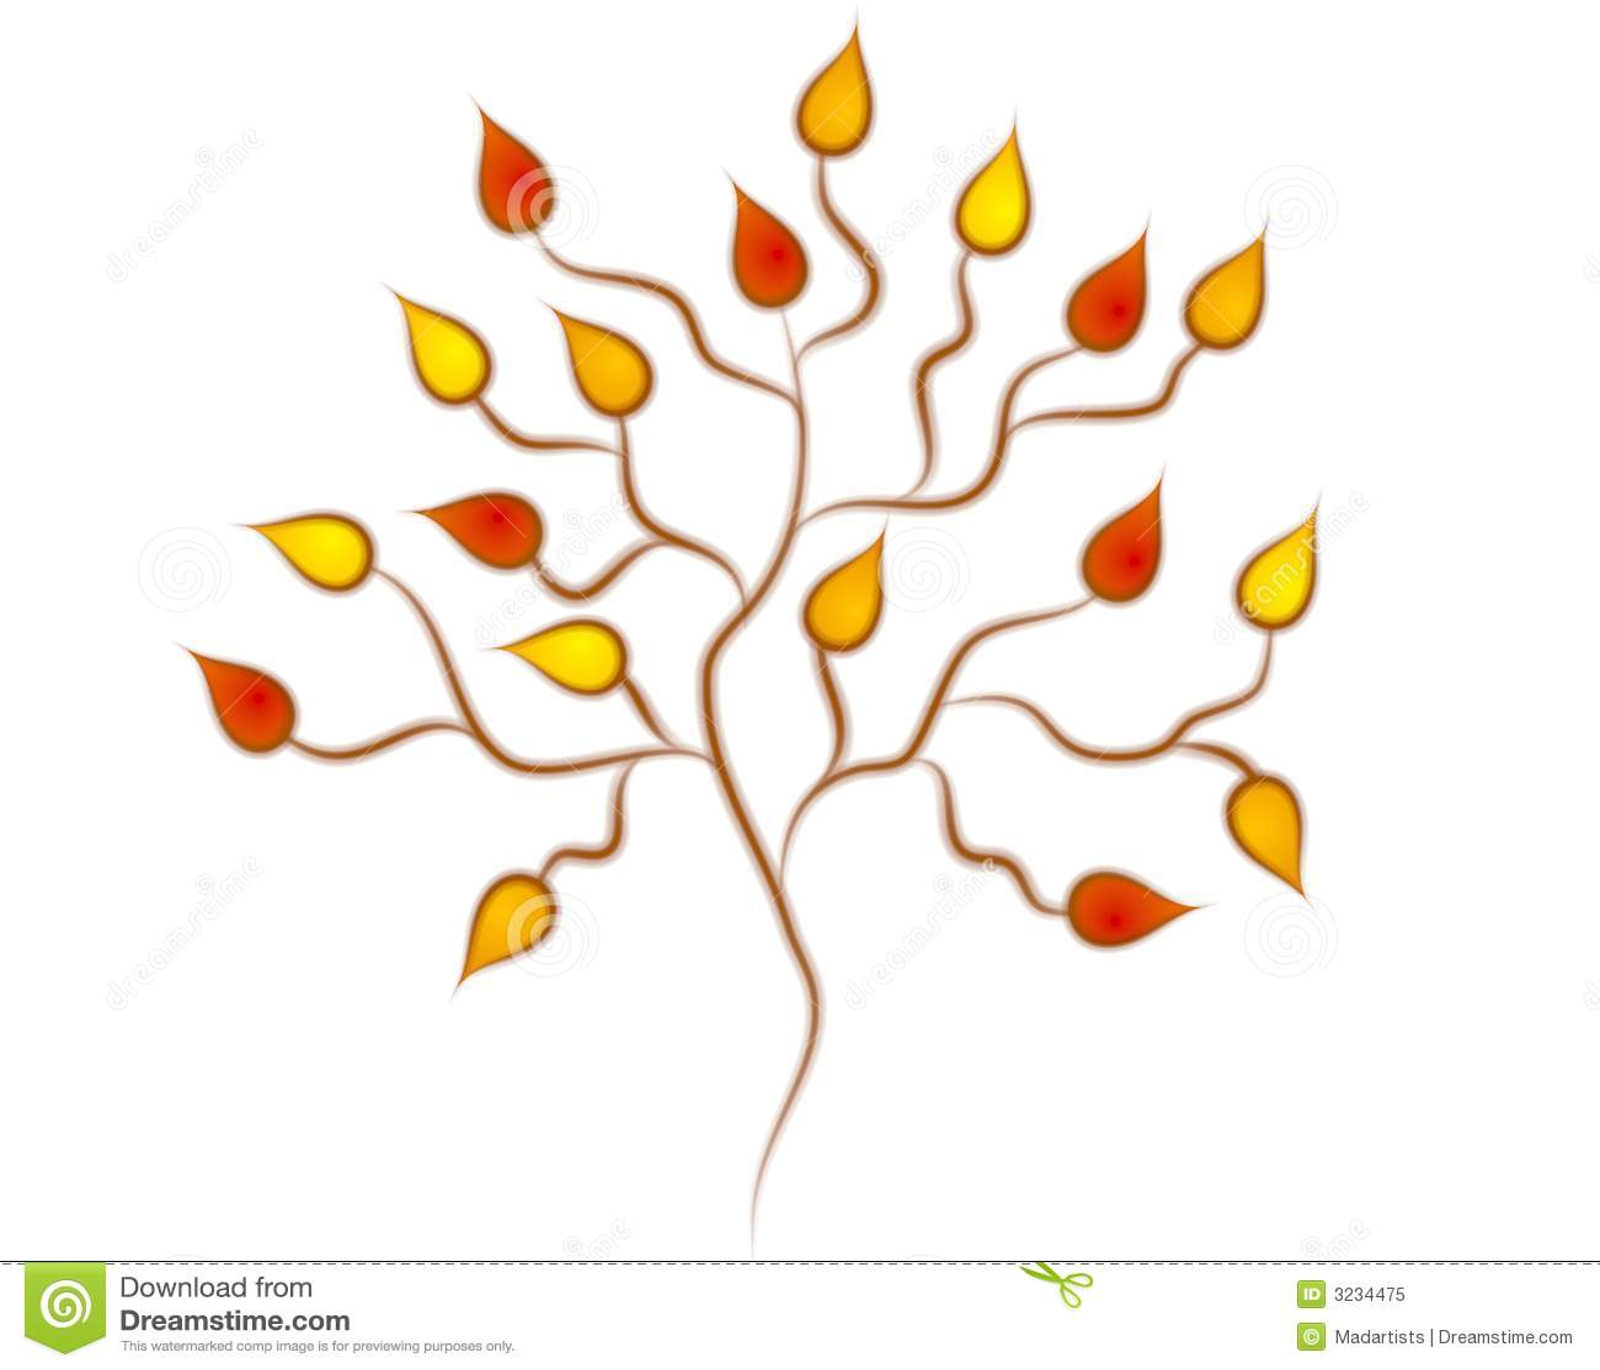 hight resolution of fall autumn tree clip art